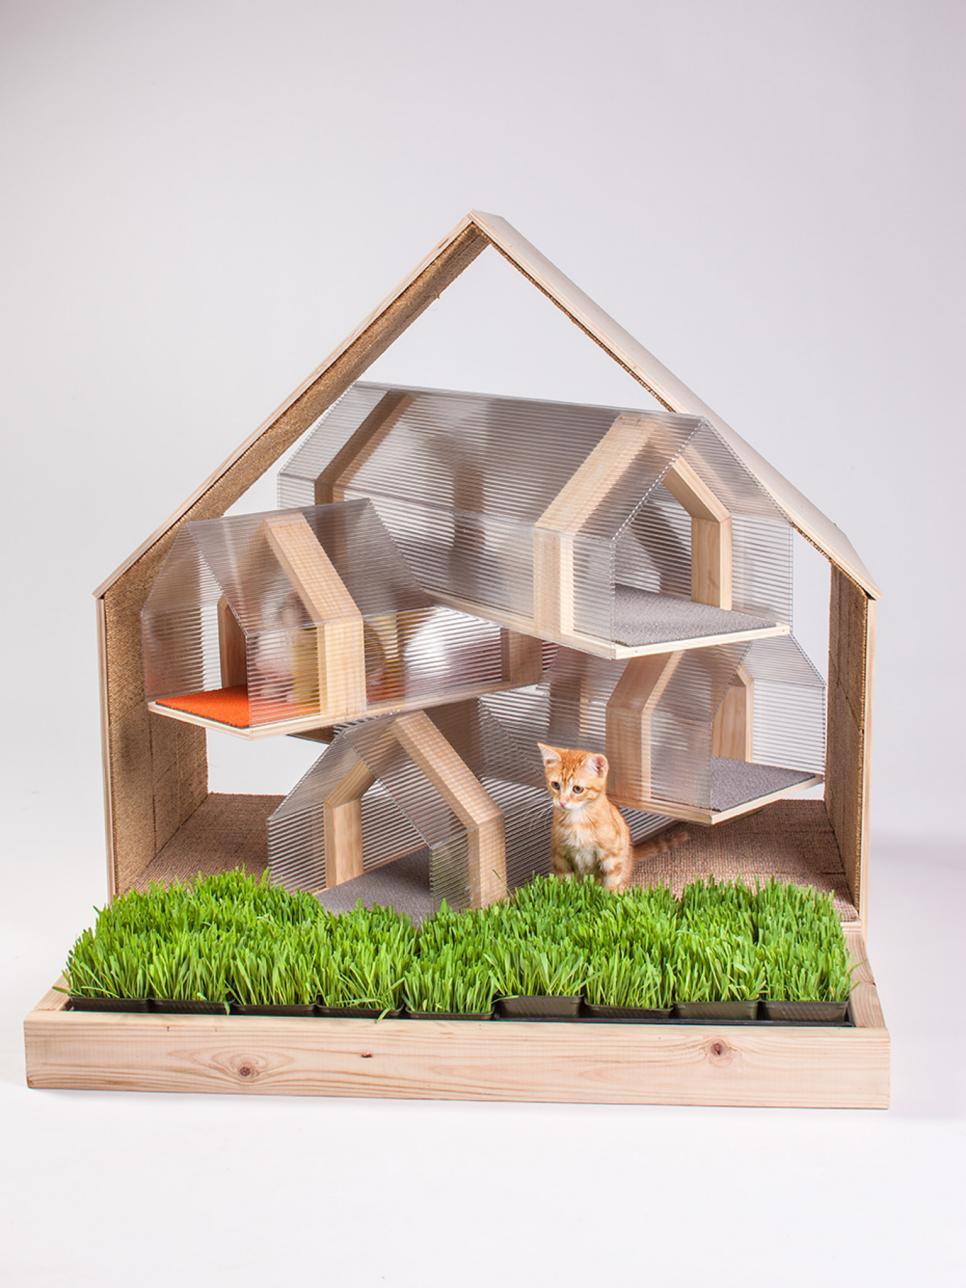 Домик для кошки из пластика и дерева